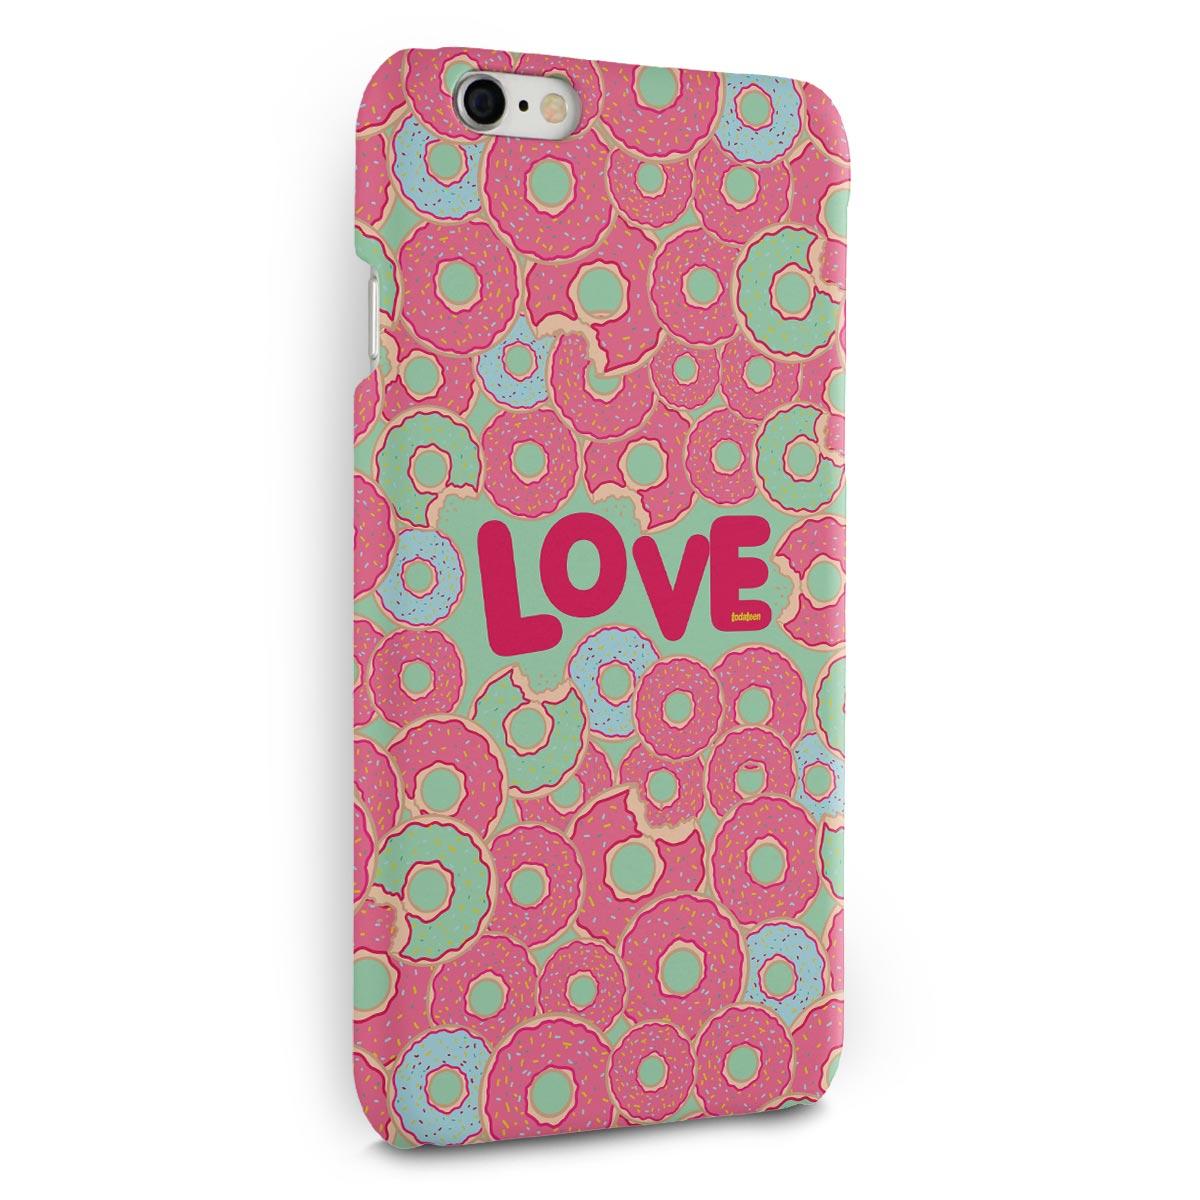 Capa para iPhone 6/6S Plus TodaTeen Love Donuts!